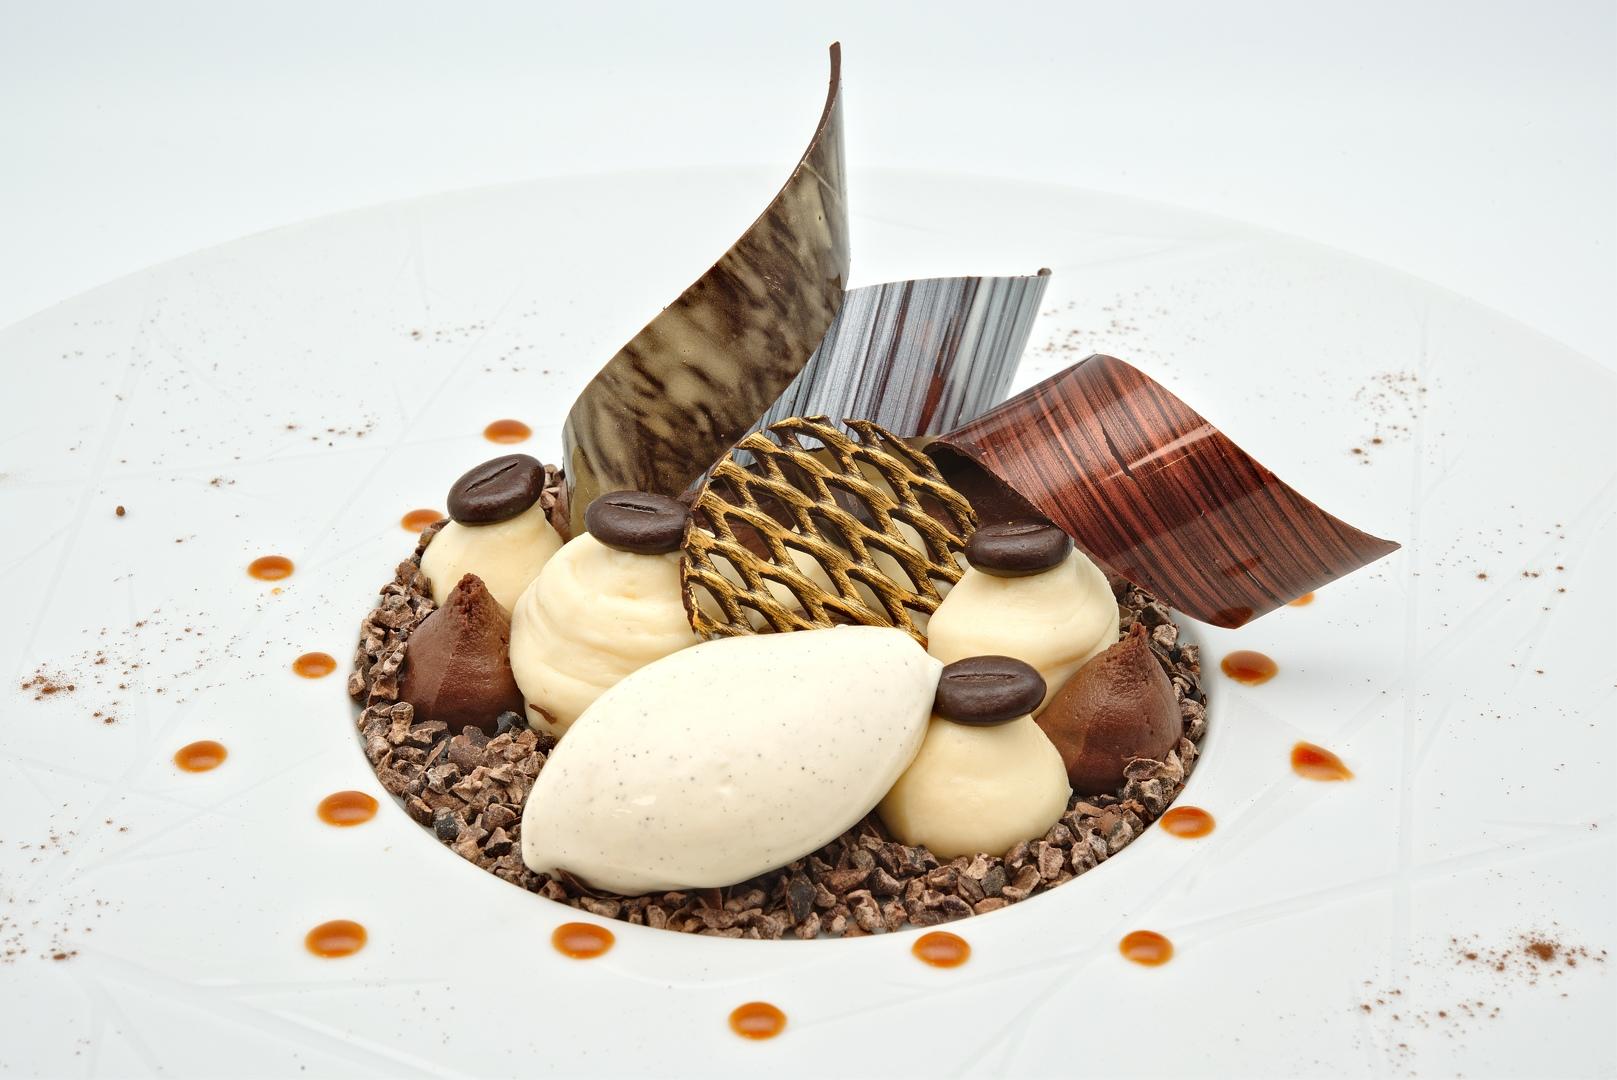 Les desserts - Page 9 20170910192247-a7b7b541-la